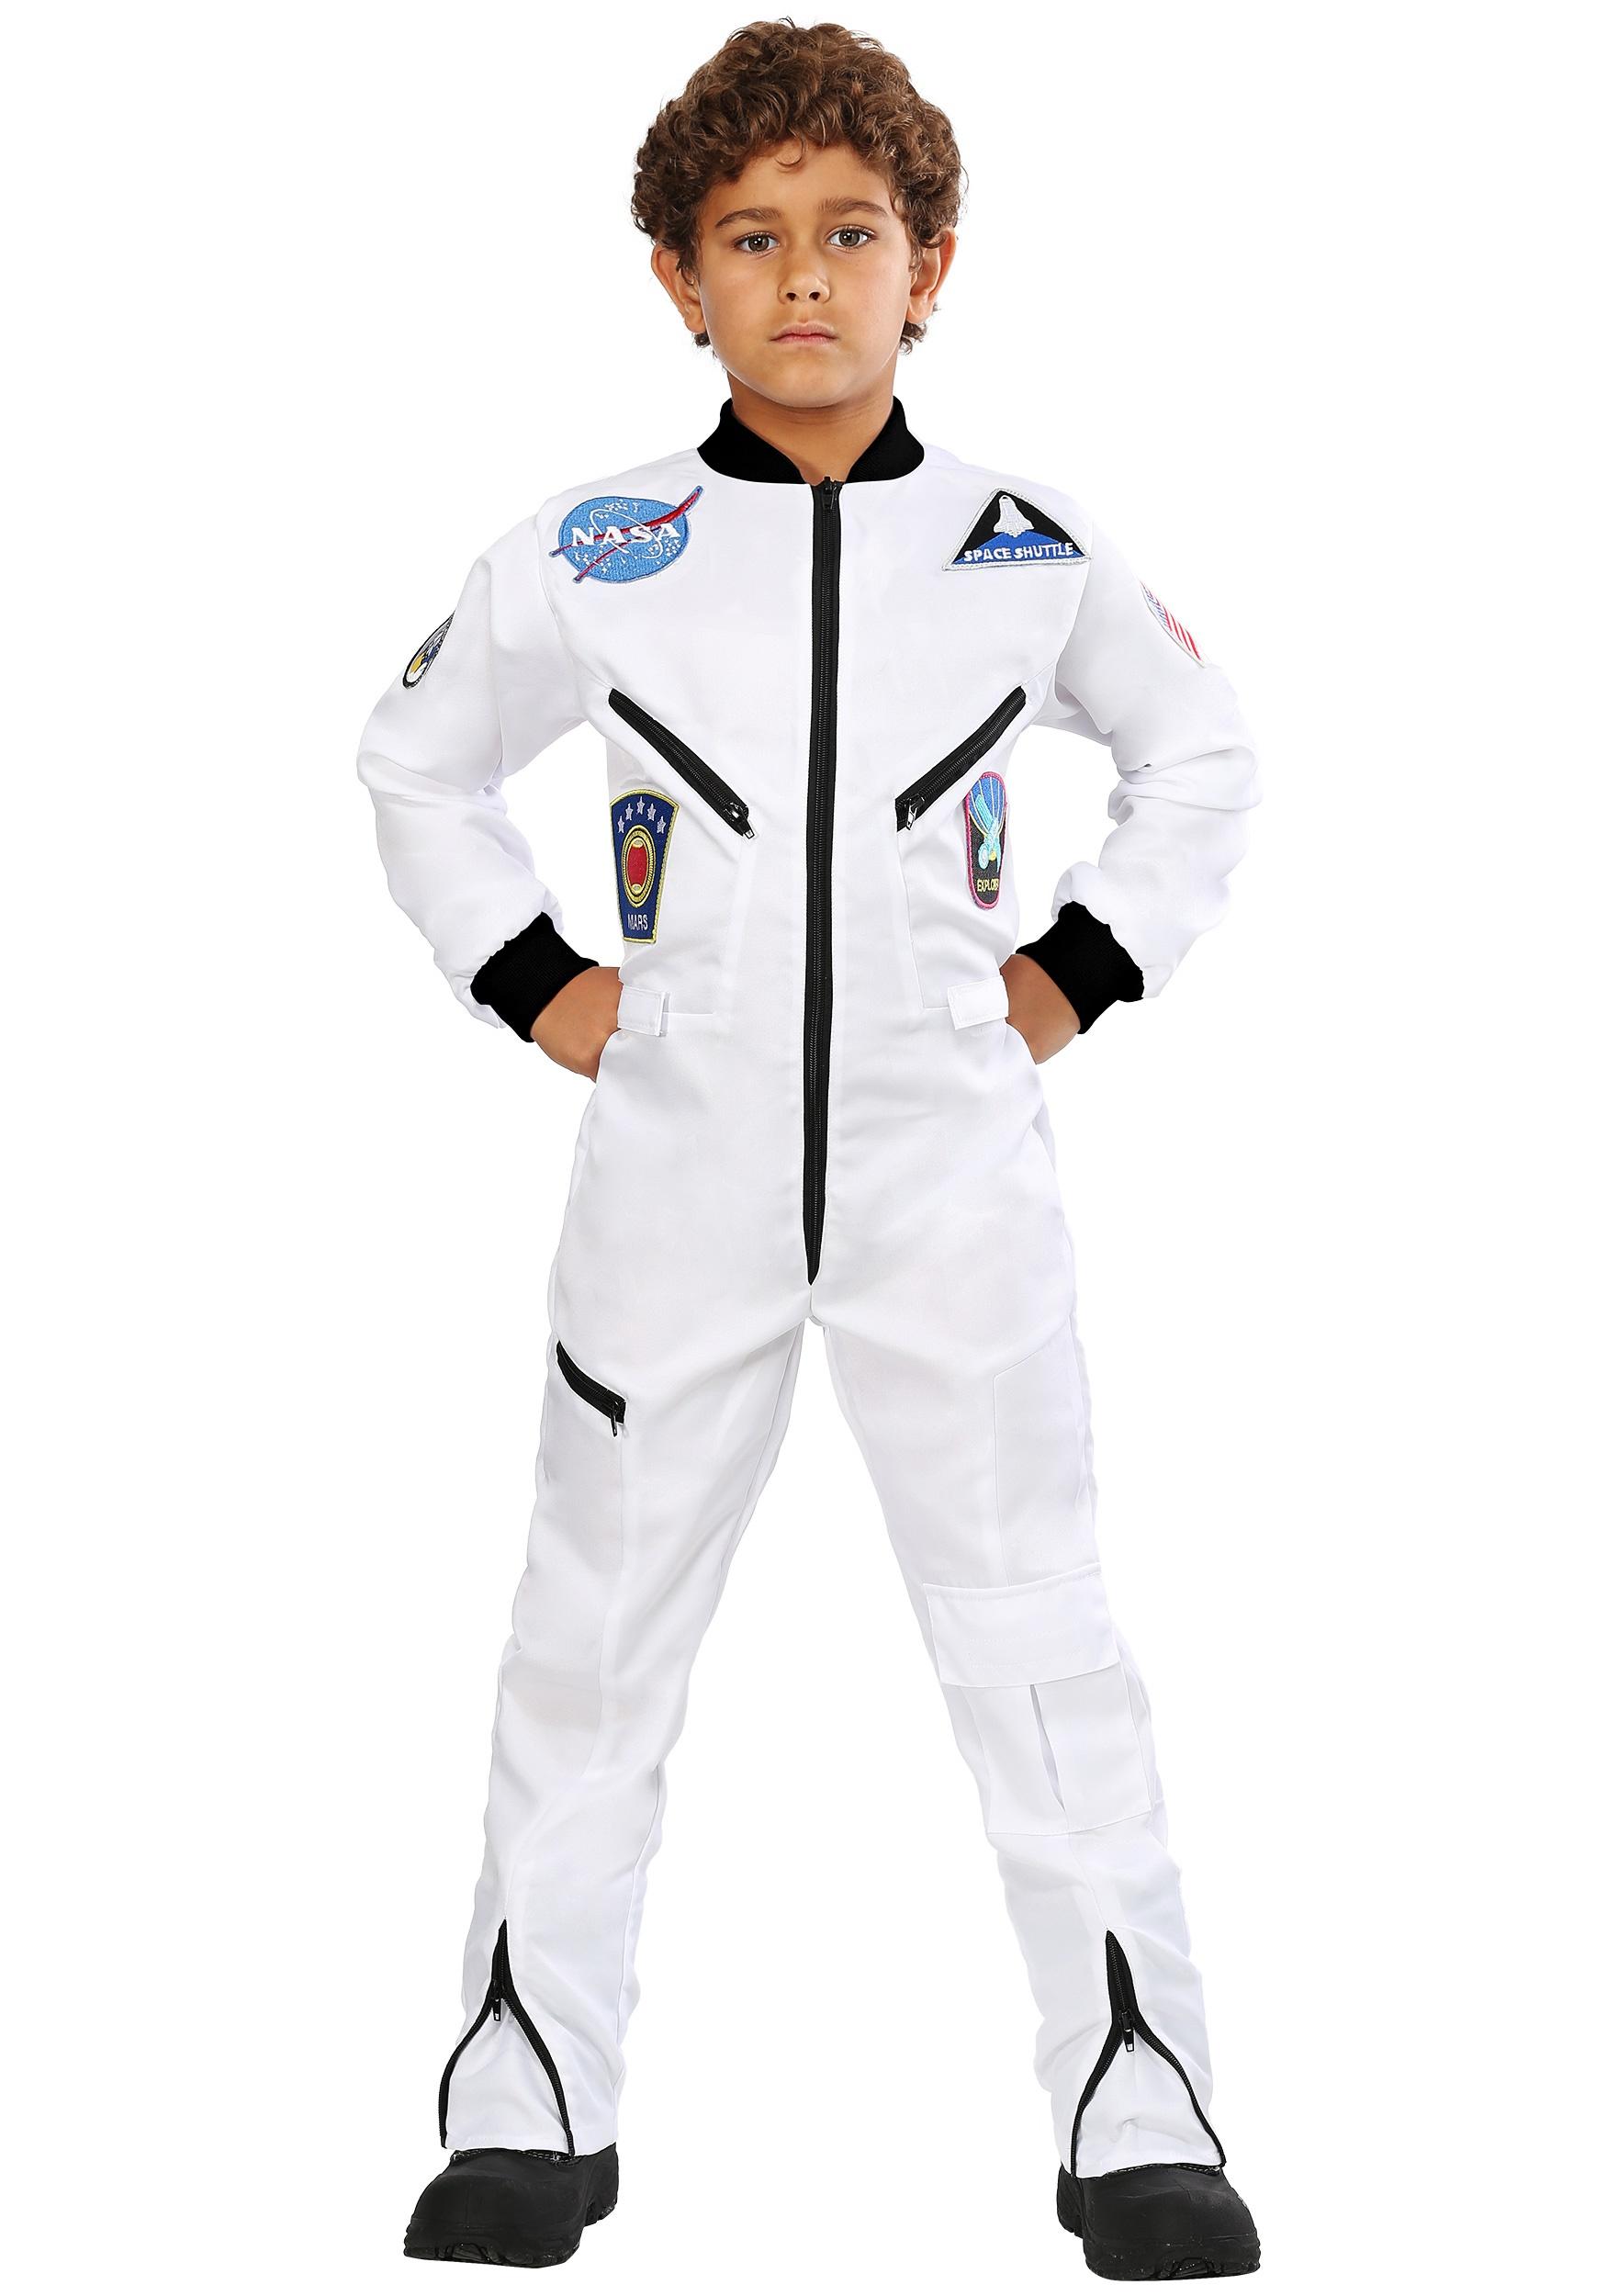 Kid's White Astronaut Jumpsuit Costume